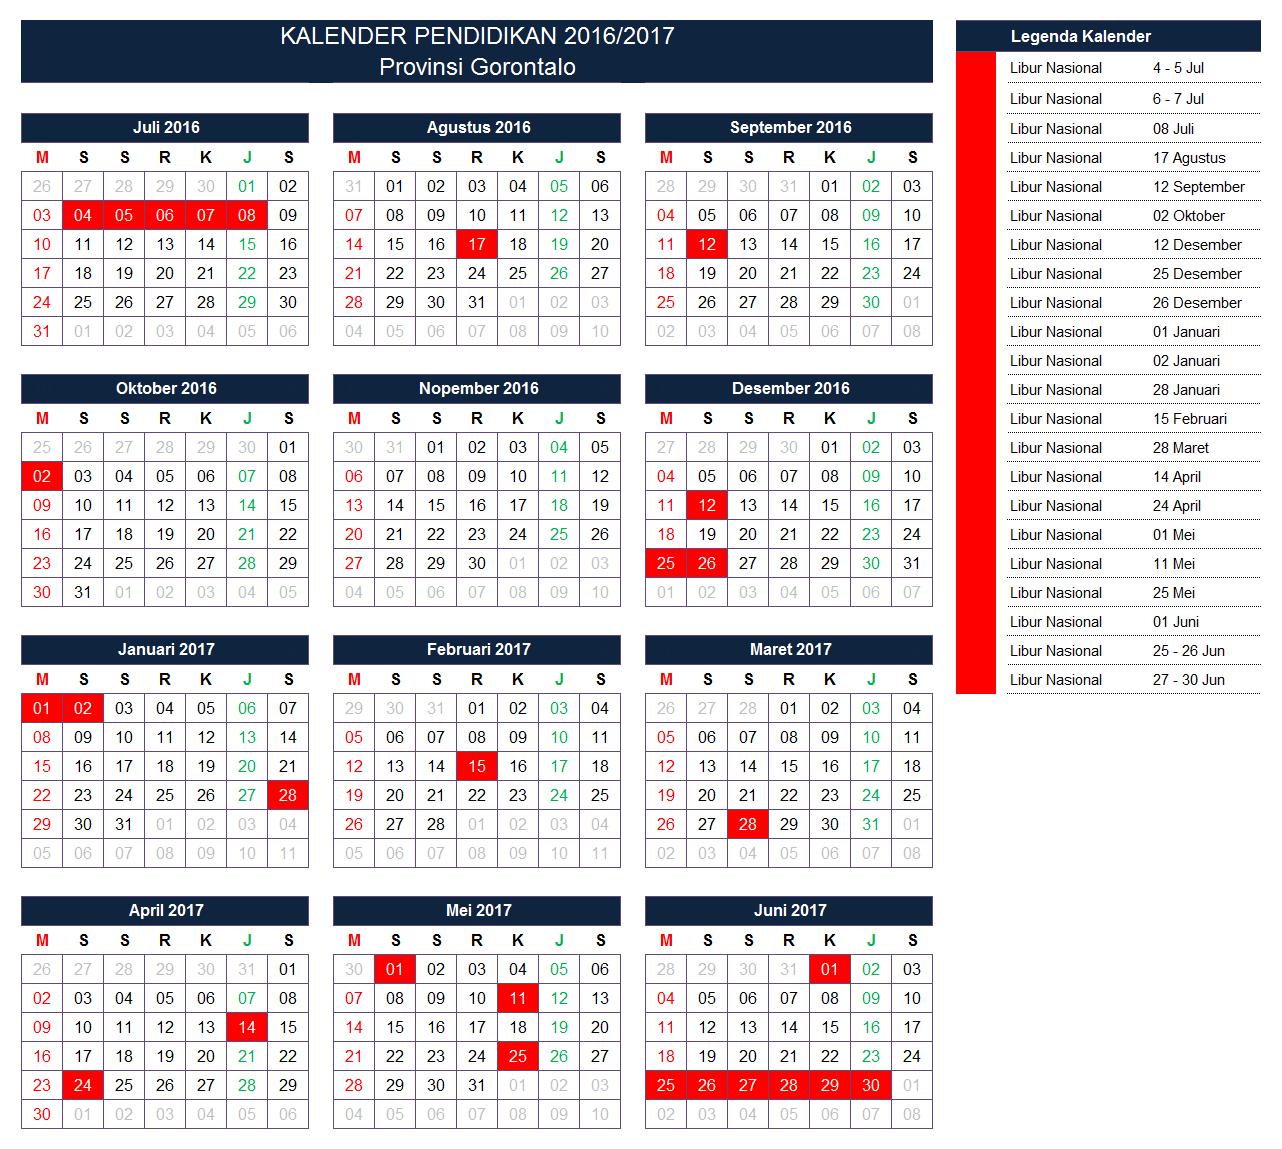 Kalender Pendidikan Provinsi Gorontalo